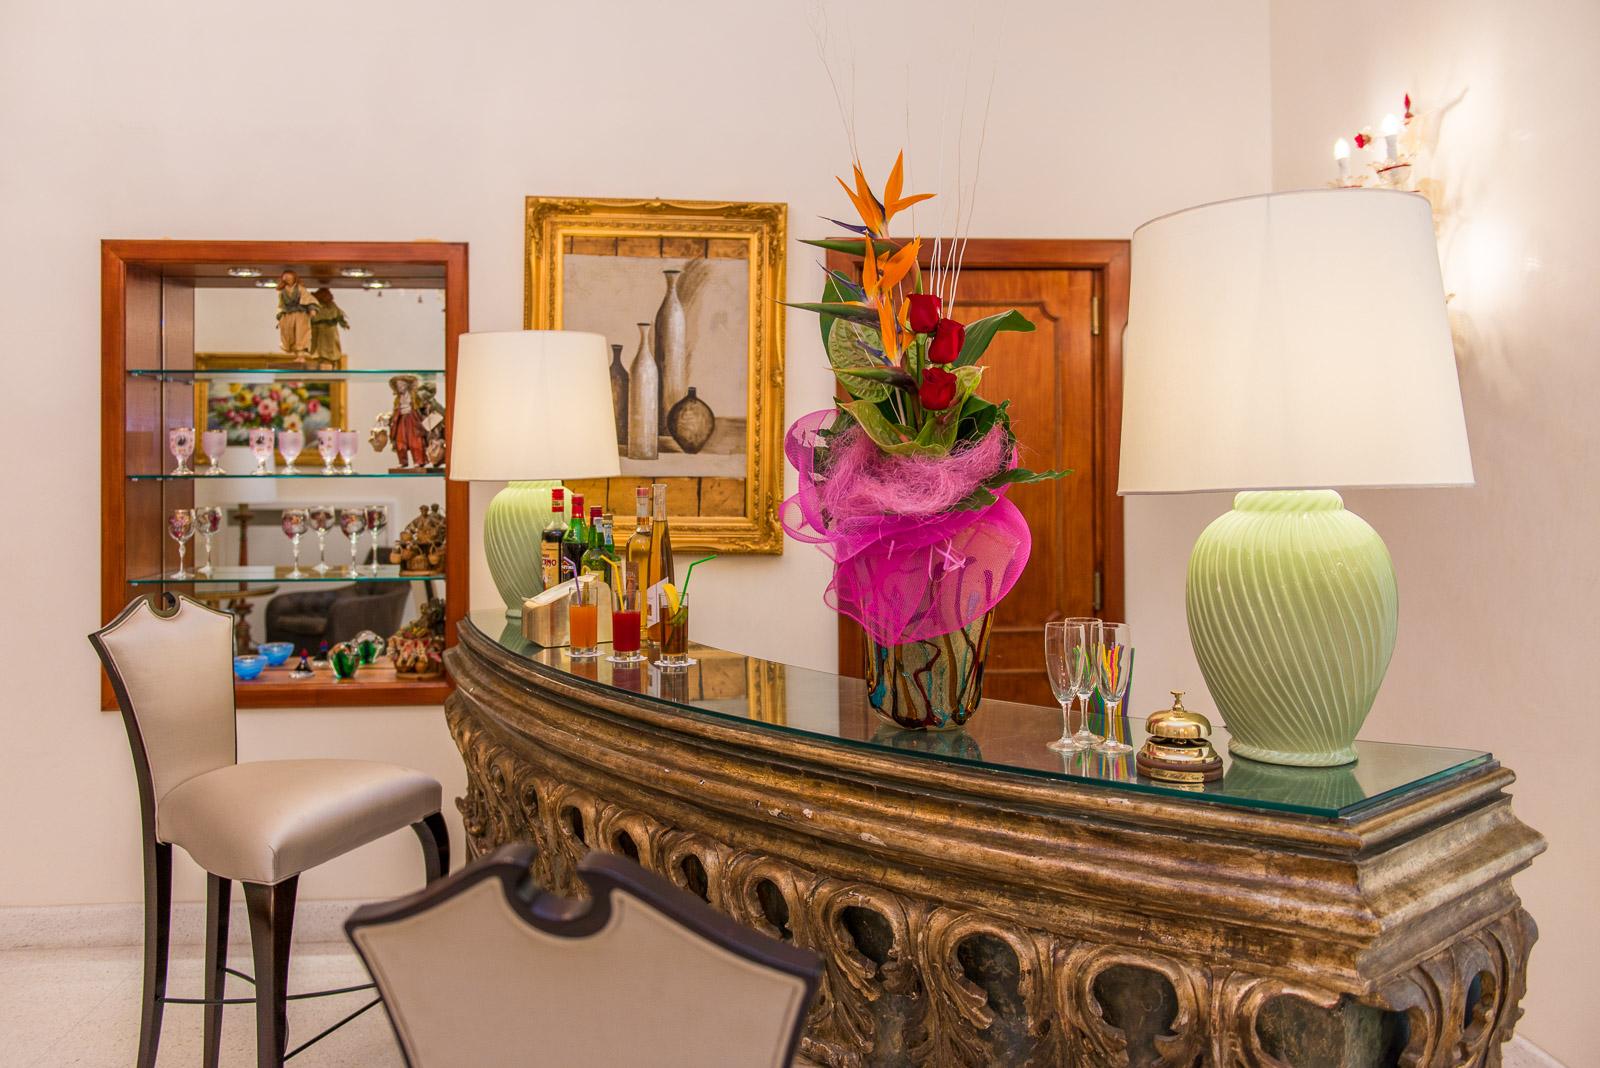 https://www.orlandinifrancesco.com/wp/wp-content/uploads/2018/09/Grand-Hotel-Lecce-8.jpg